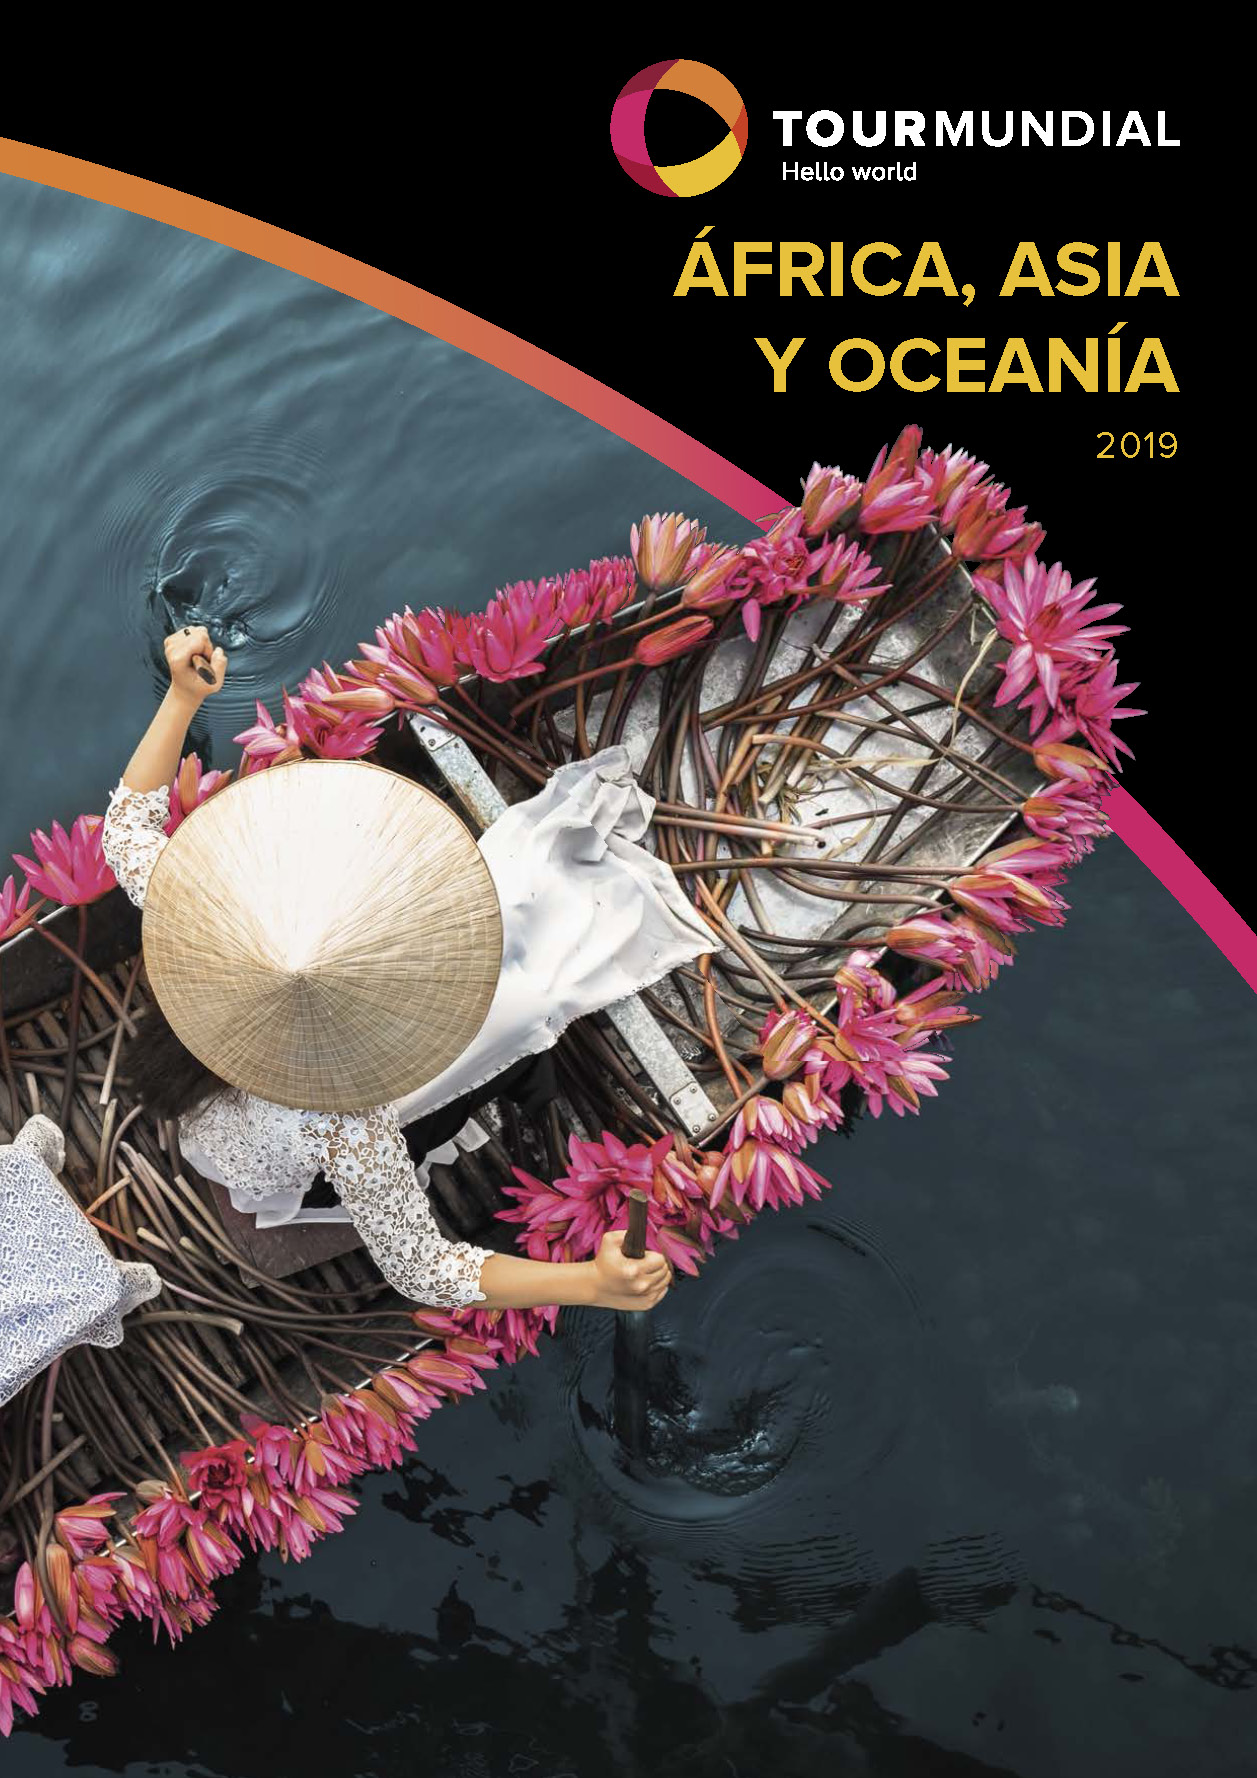 Catalogo Tourmundial Africa, Asia y Oceania 2019